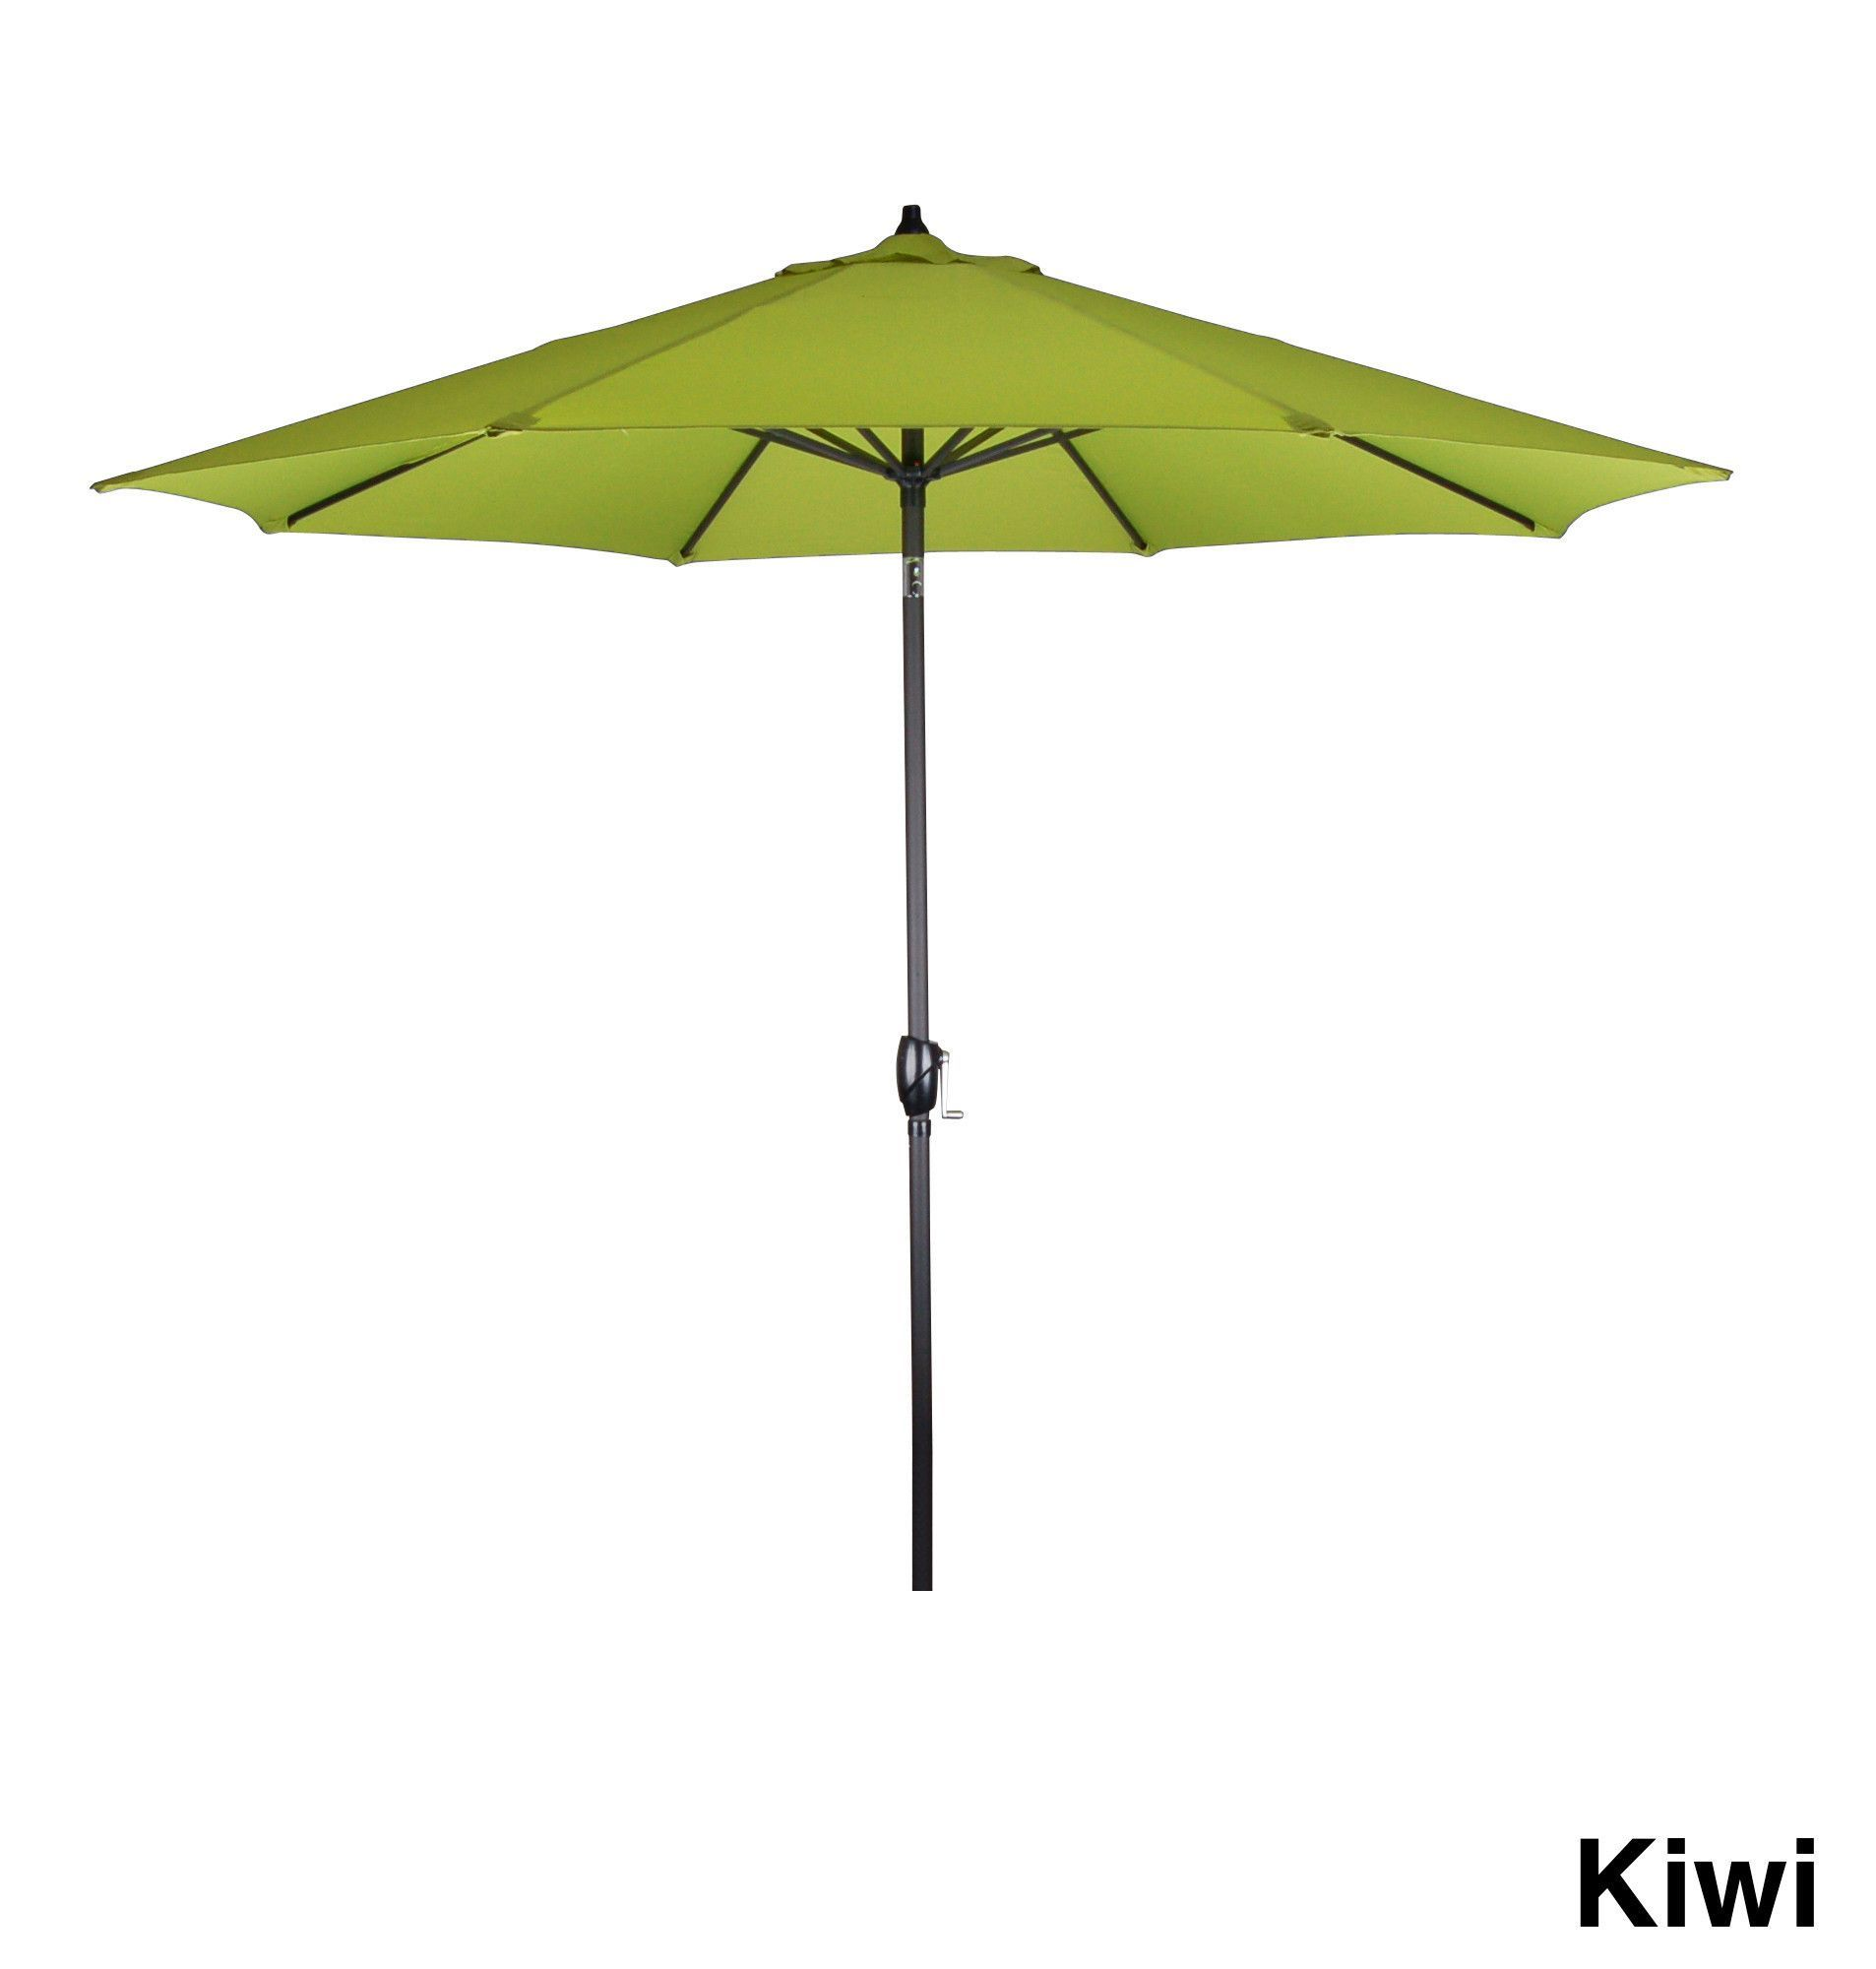 Michael Anthony Furniture 9Ì_Ì_åÈ Aluminum Frame Green Market Umbrella - Kiwi